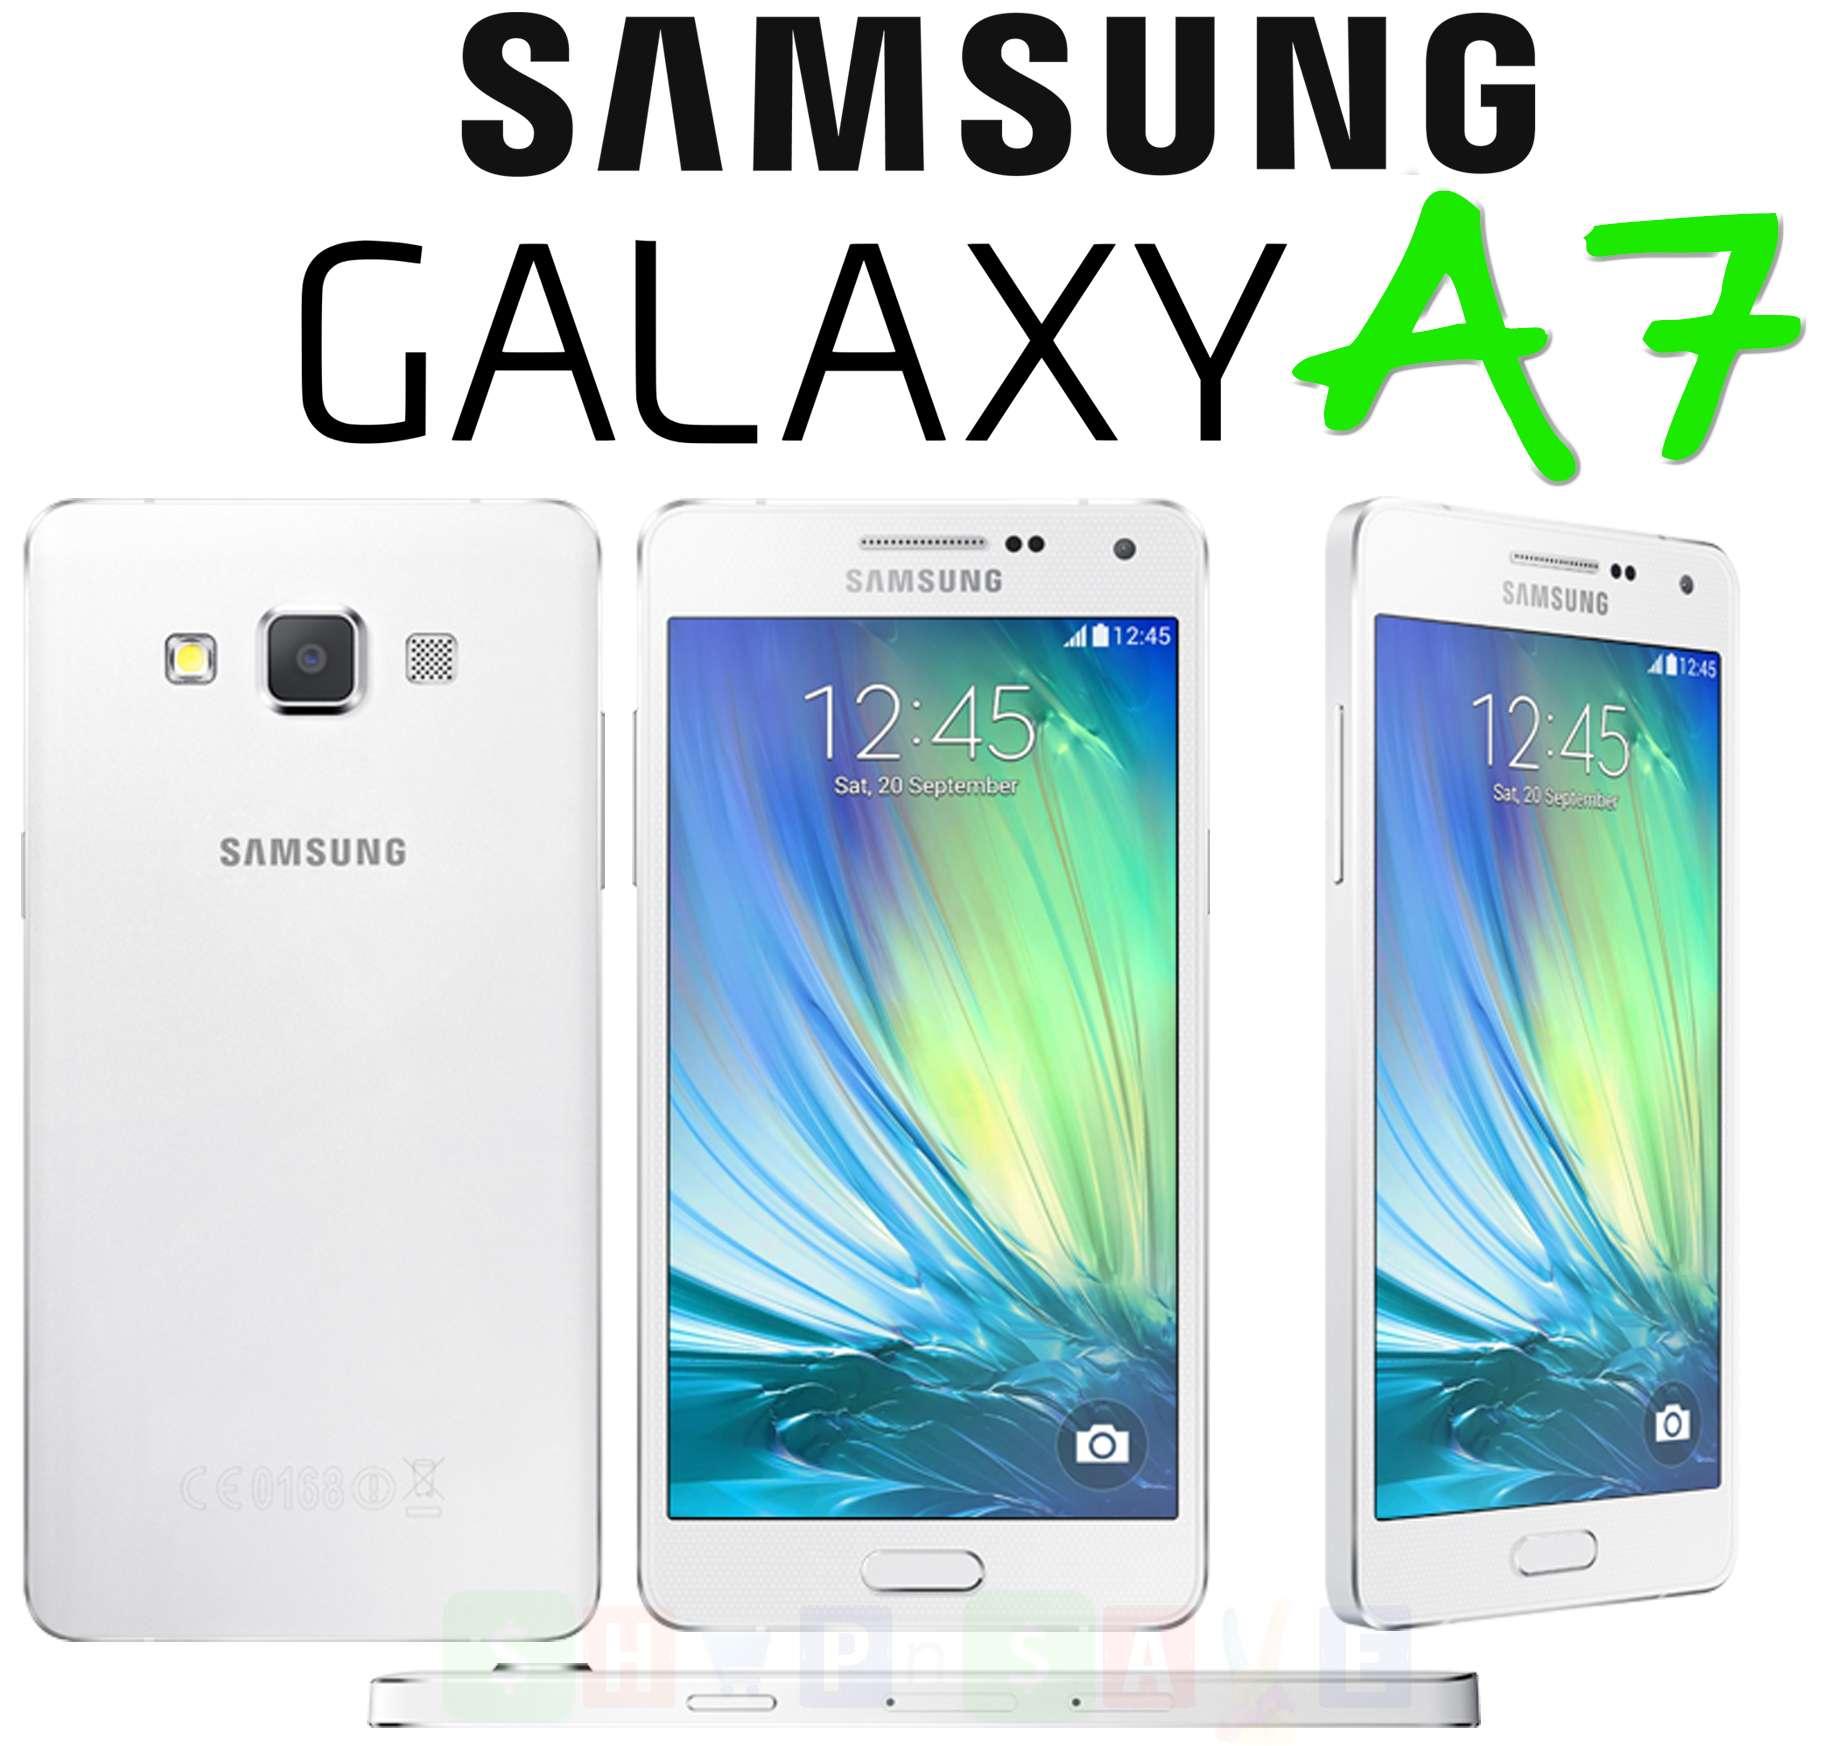 details about samsung galaxy a7 white samsung india warranty